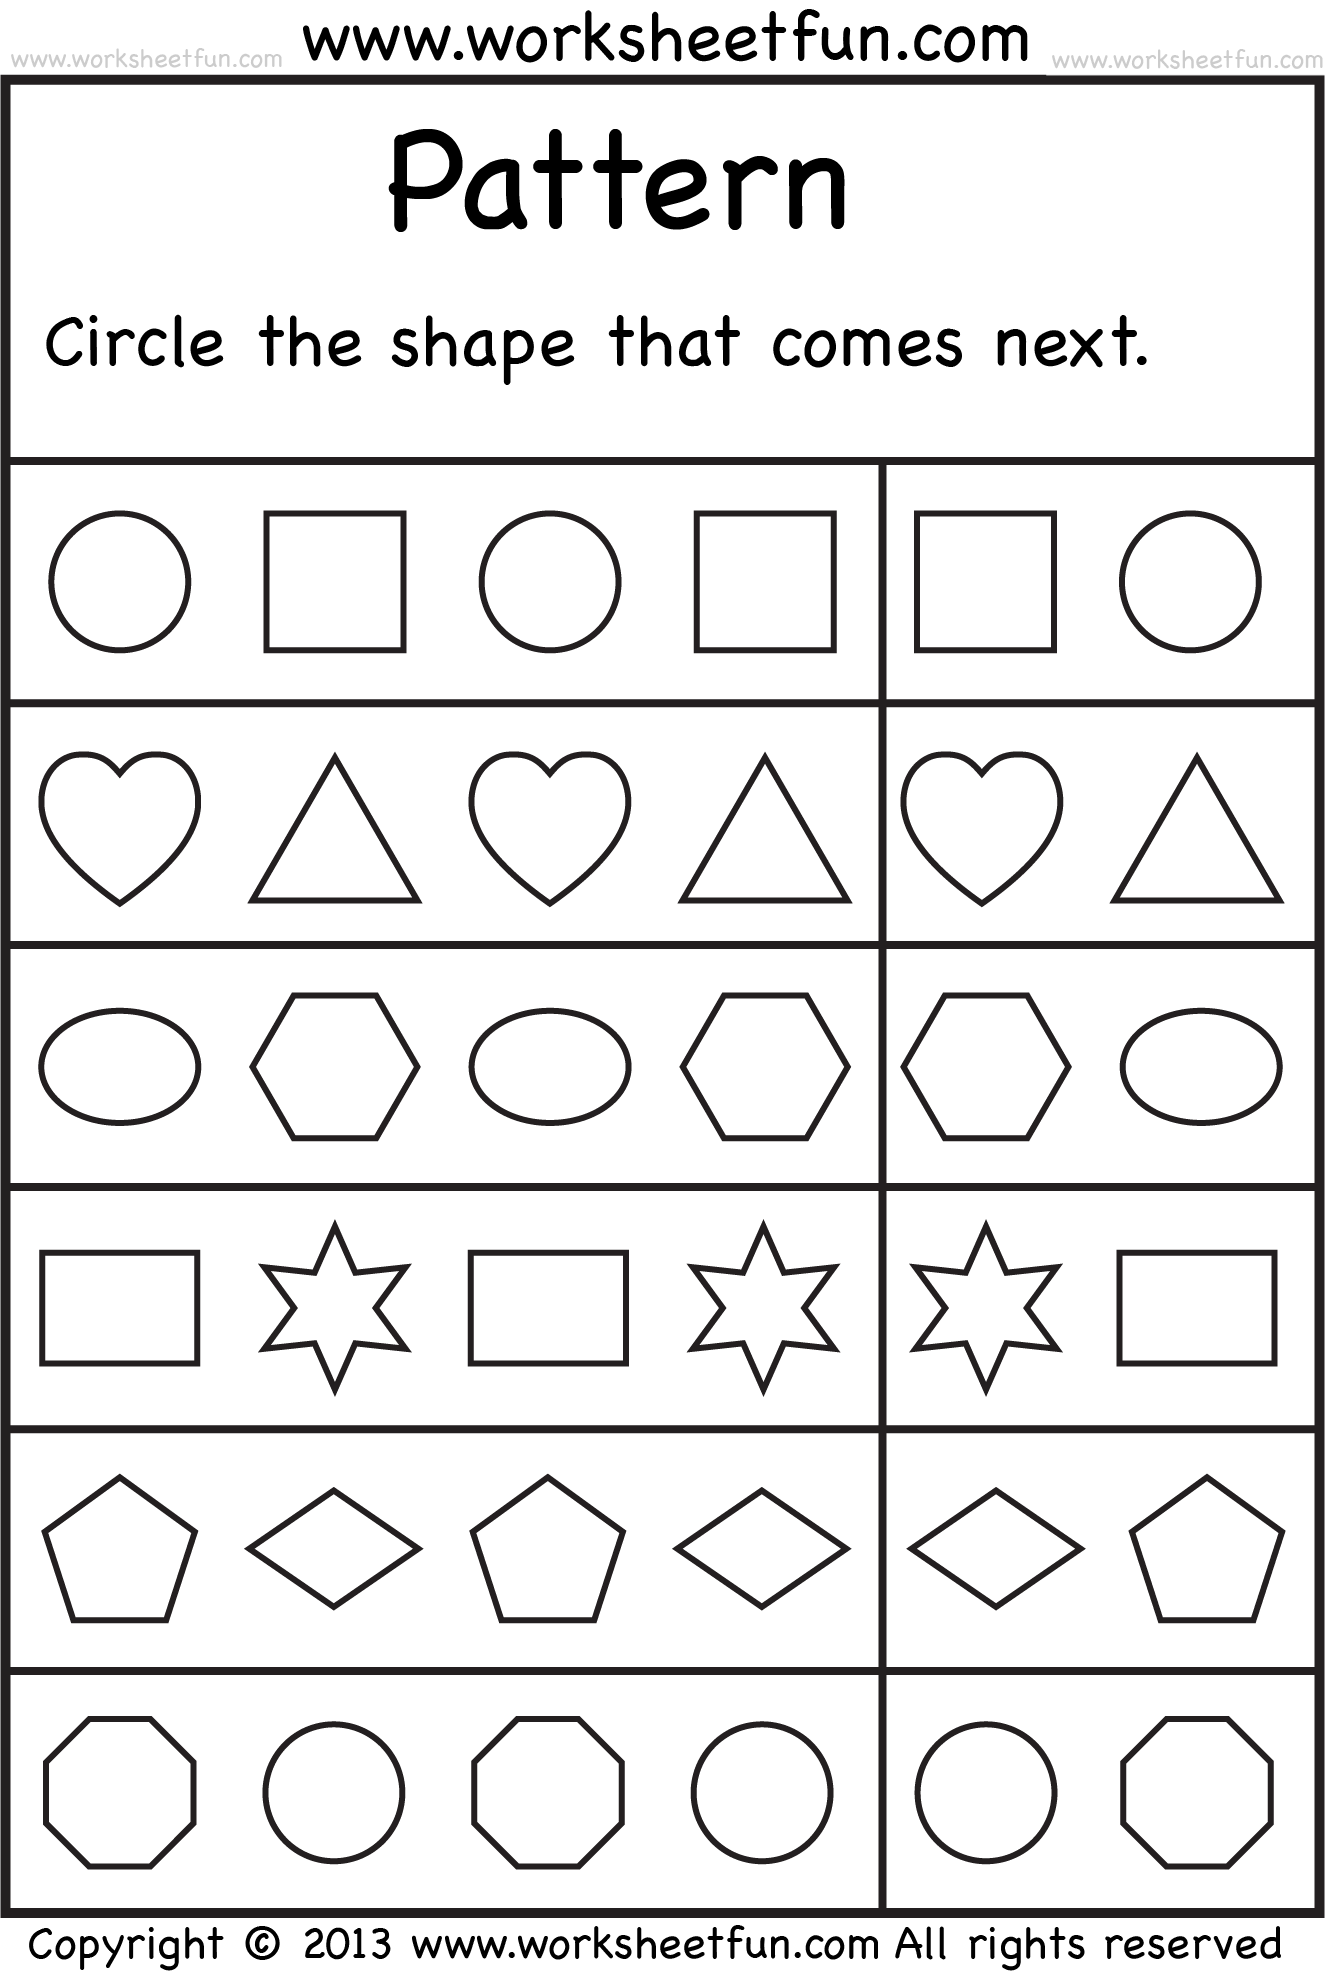 Kindergarten Worksheet   Pattern Worksheet, Patterning